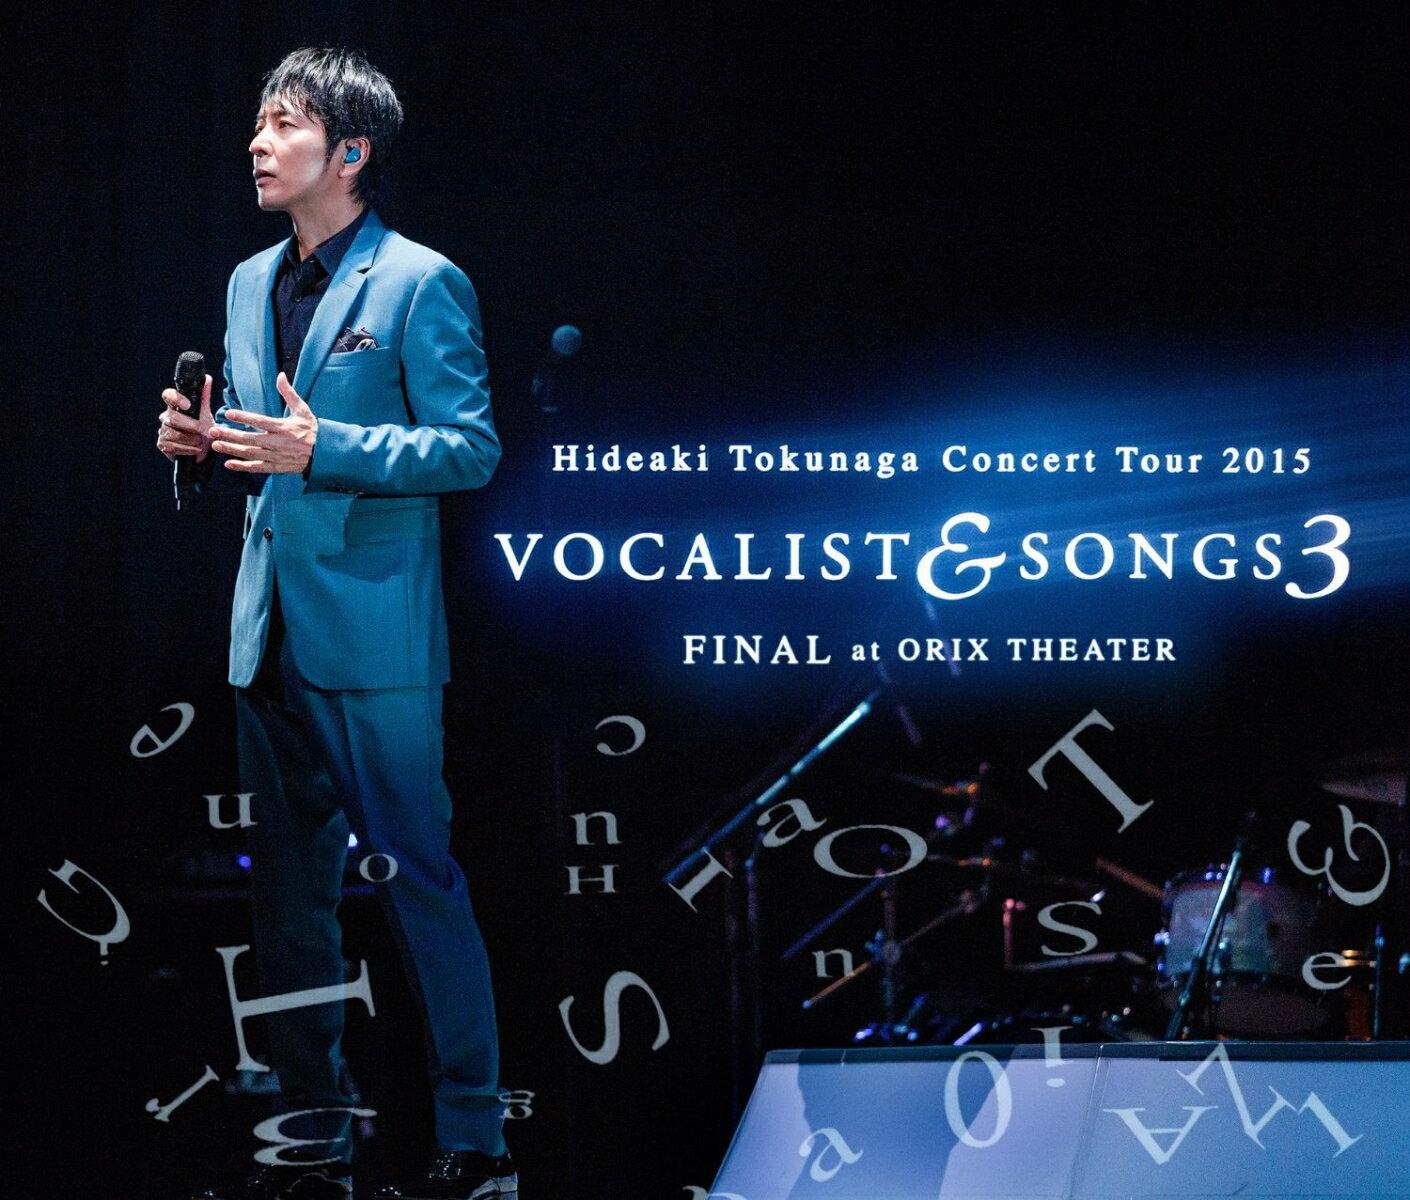 Concert Tour 2015 VOCALIST & SONGS 3 FINAL at ORIX THEATER (初回限定盤 2CD+DVD)画像